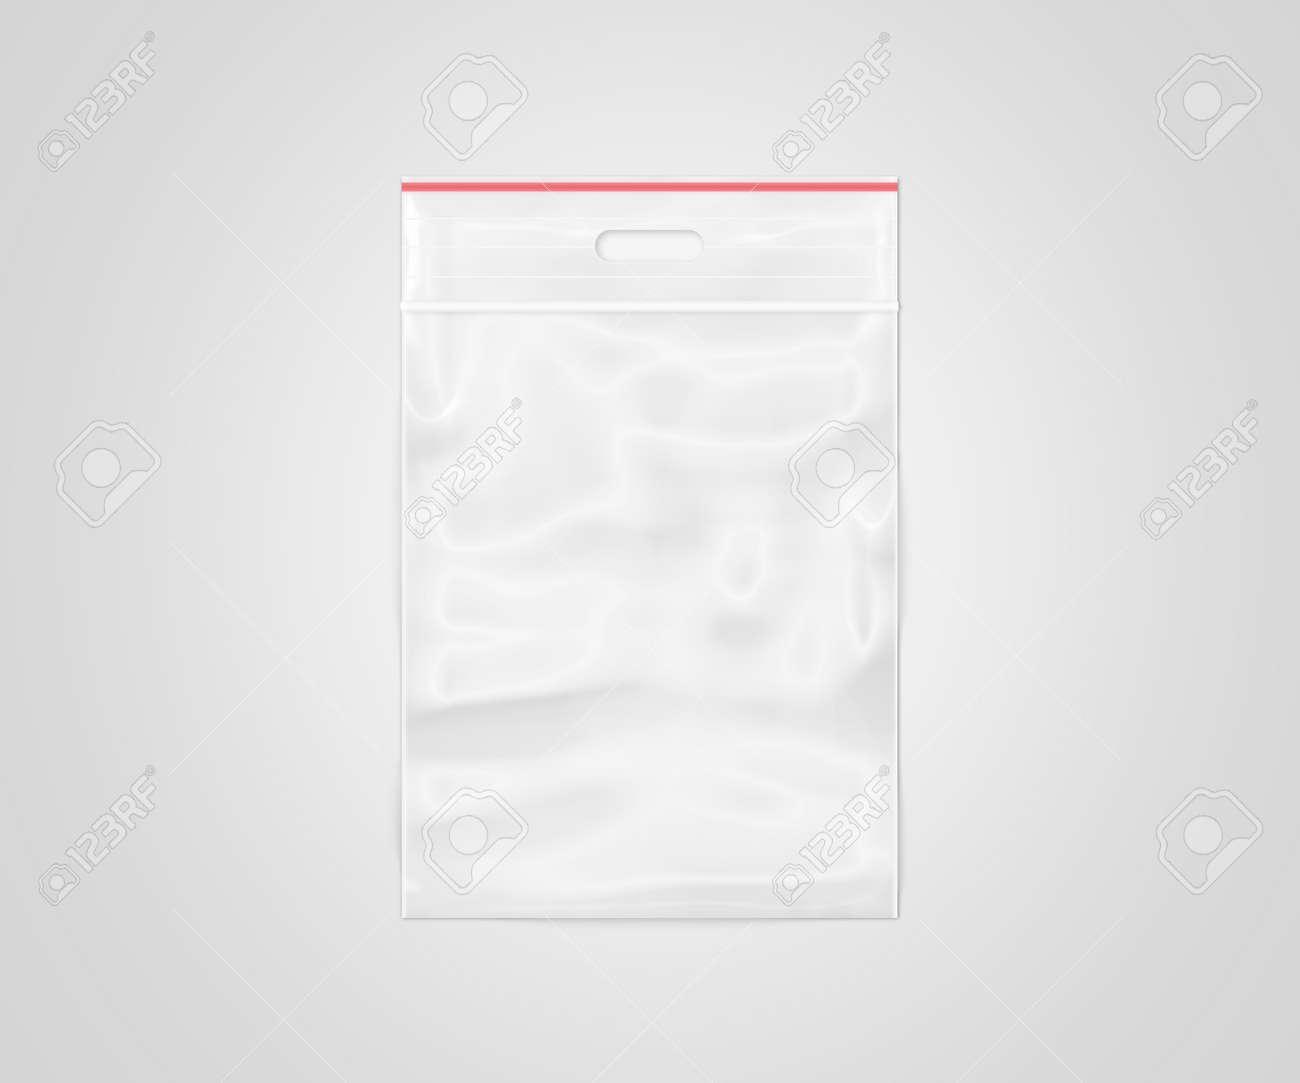 d4eebd5e4081a Illustration - Plastic transparent zipper bag isolated, 3d illustration.  Blank zip lock packaging design. Empty polythene sealed wrap. Clear pack  mock up.